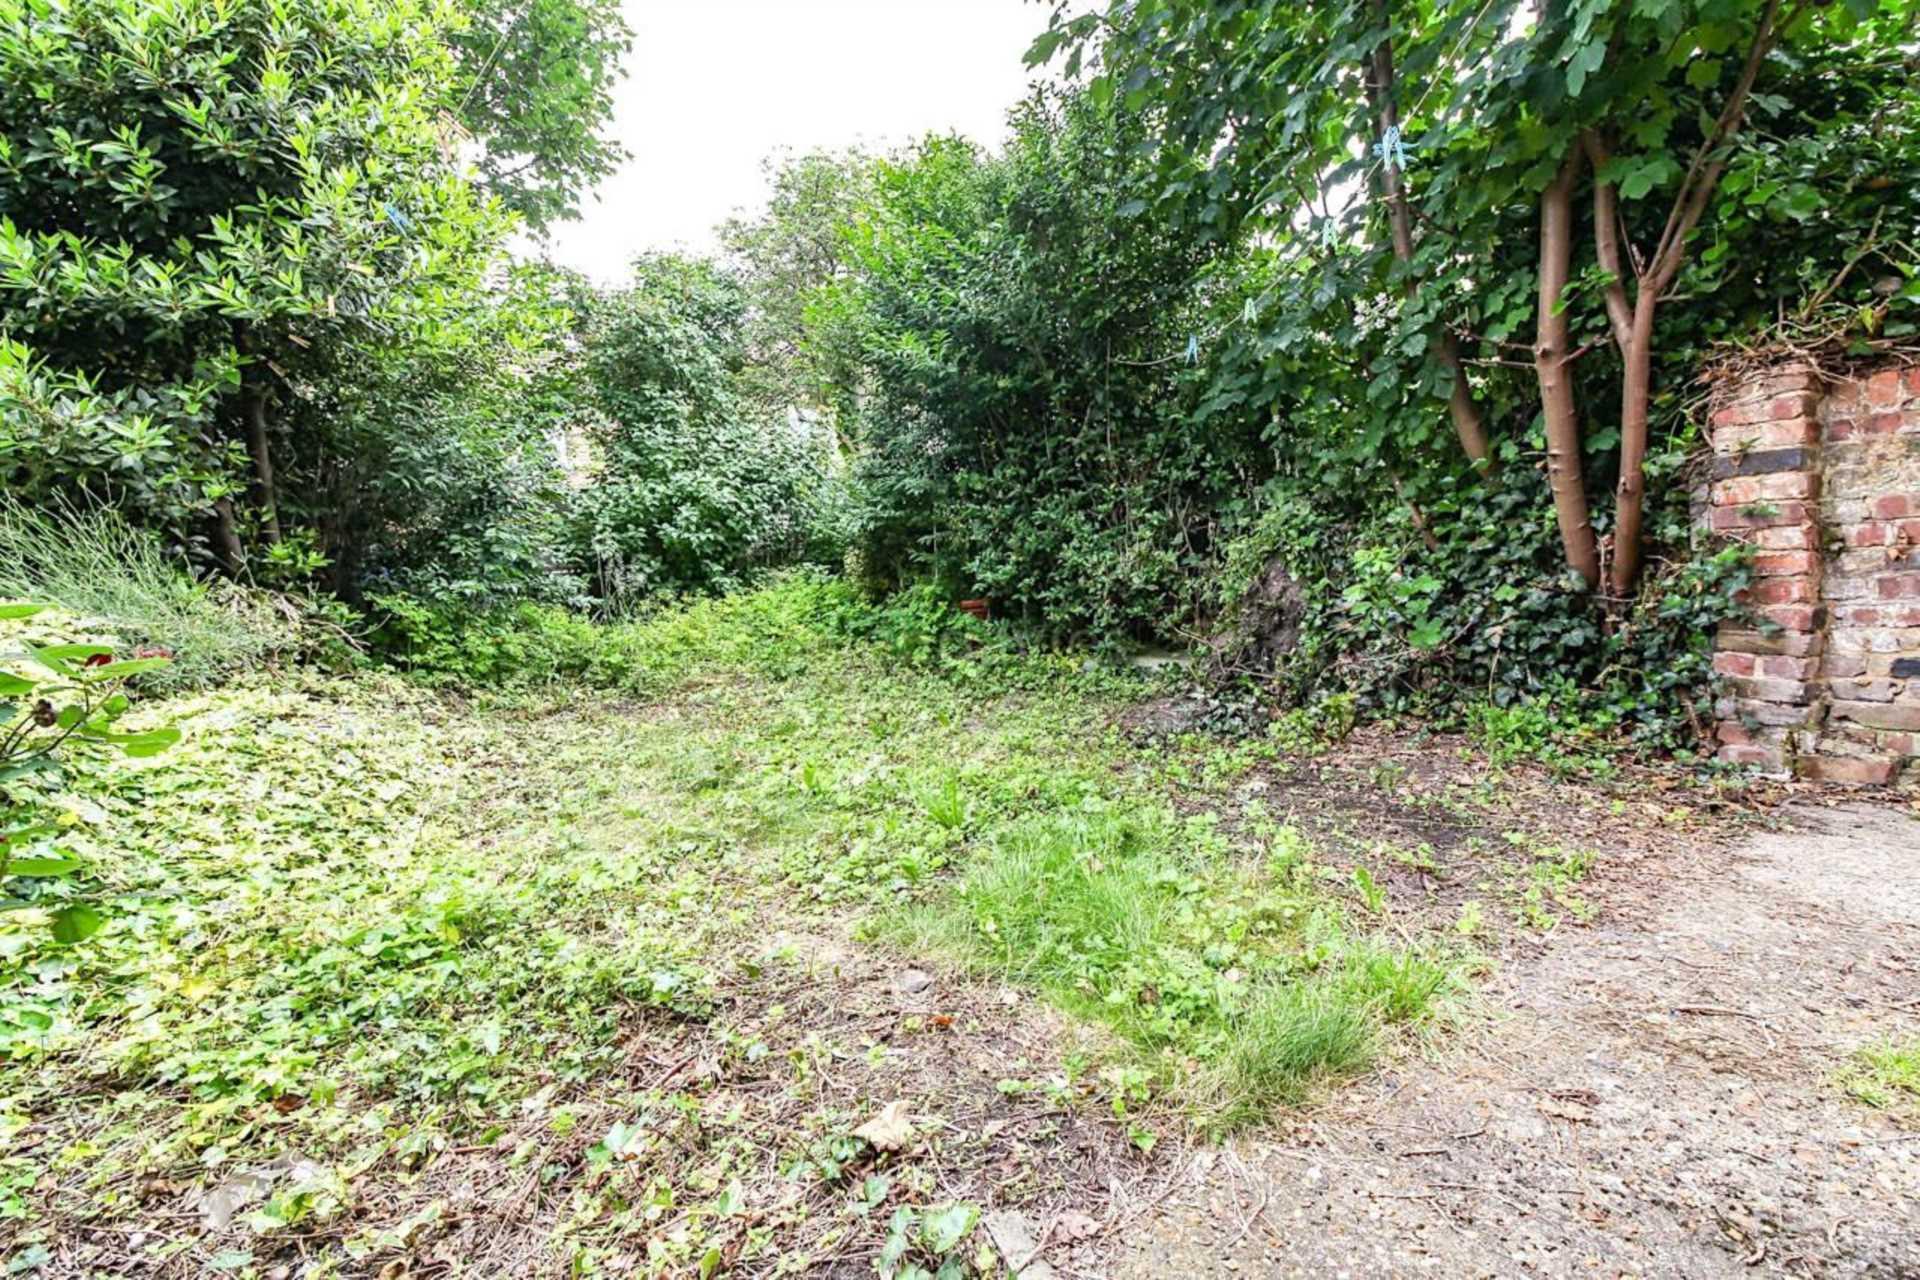 Frith Road, Leytonstone, Image 16